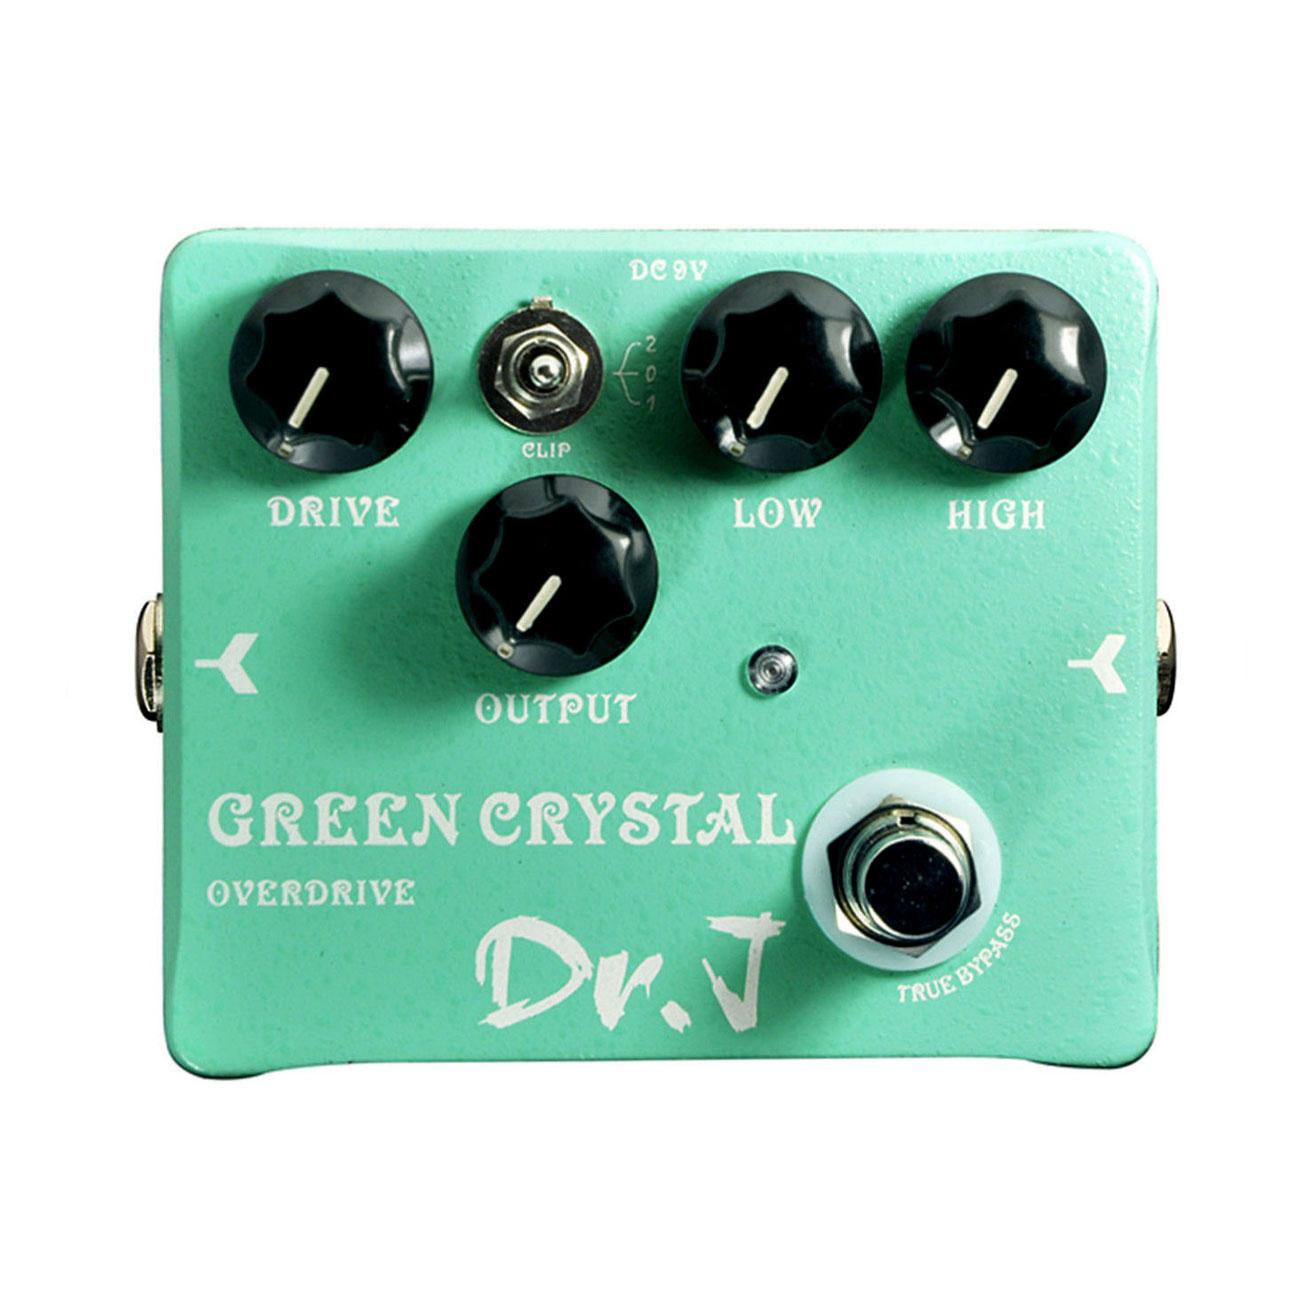 [D-50 Green Crystal]